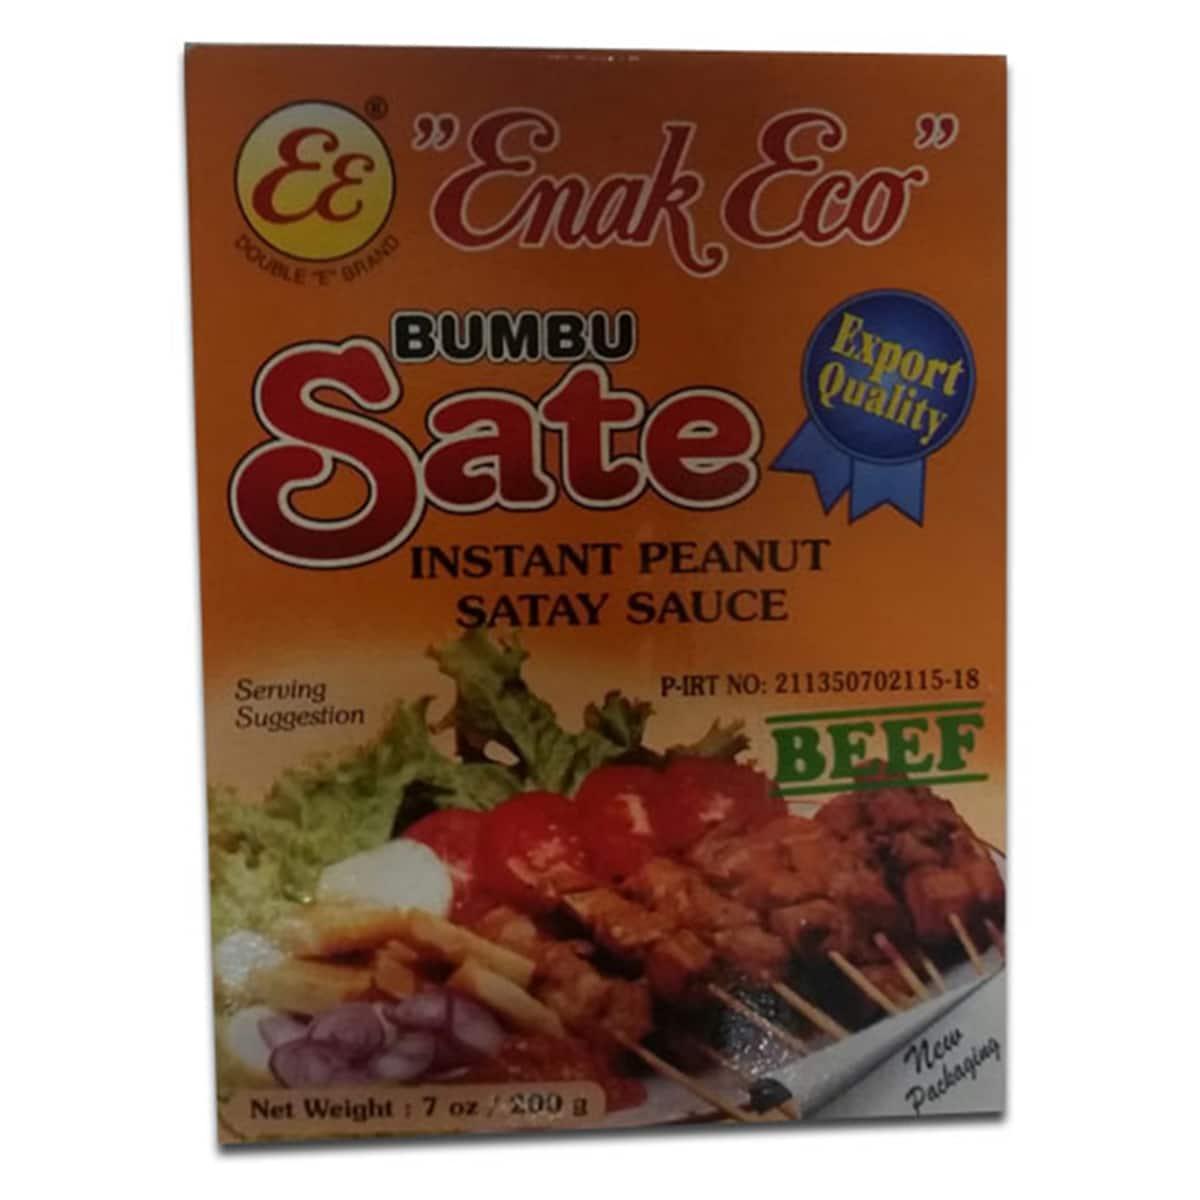 Buy Enak Eco Bumbu Sate (Instant Peanut Satay Sauce) Beef - 200 gm